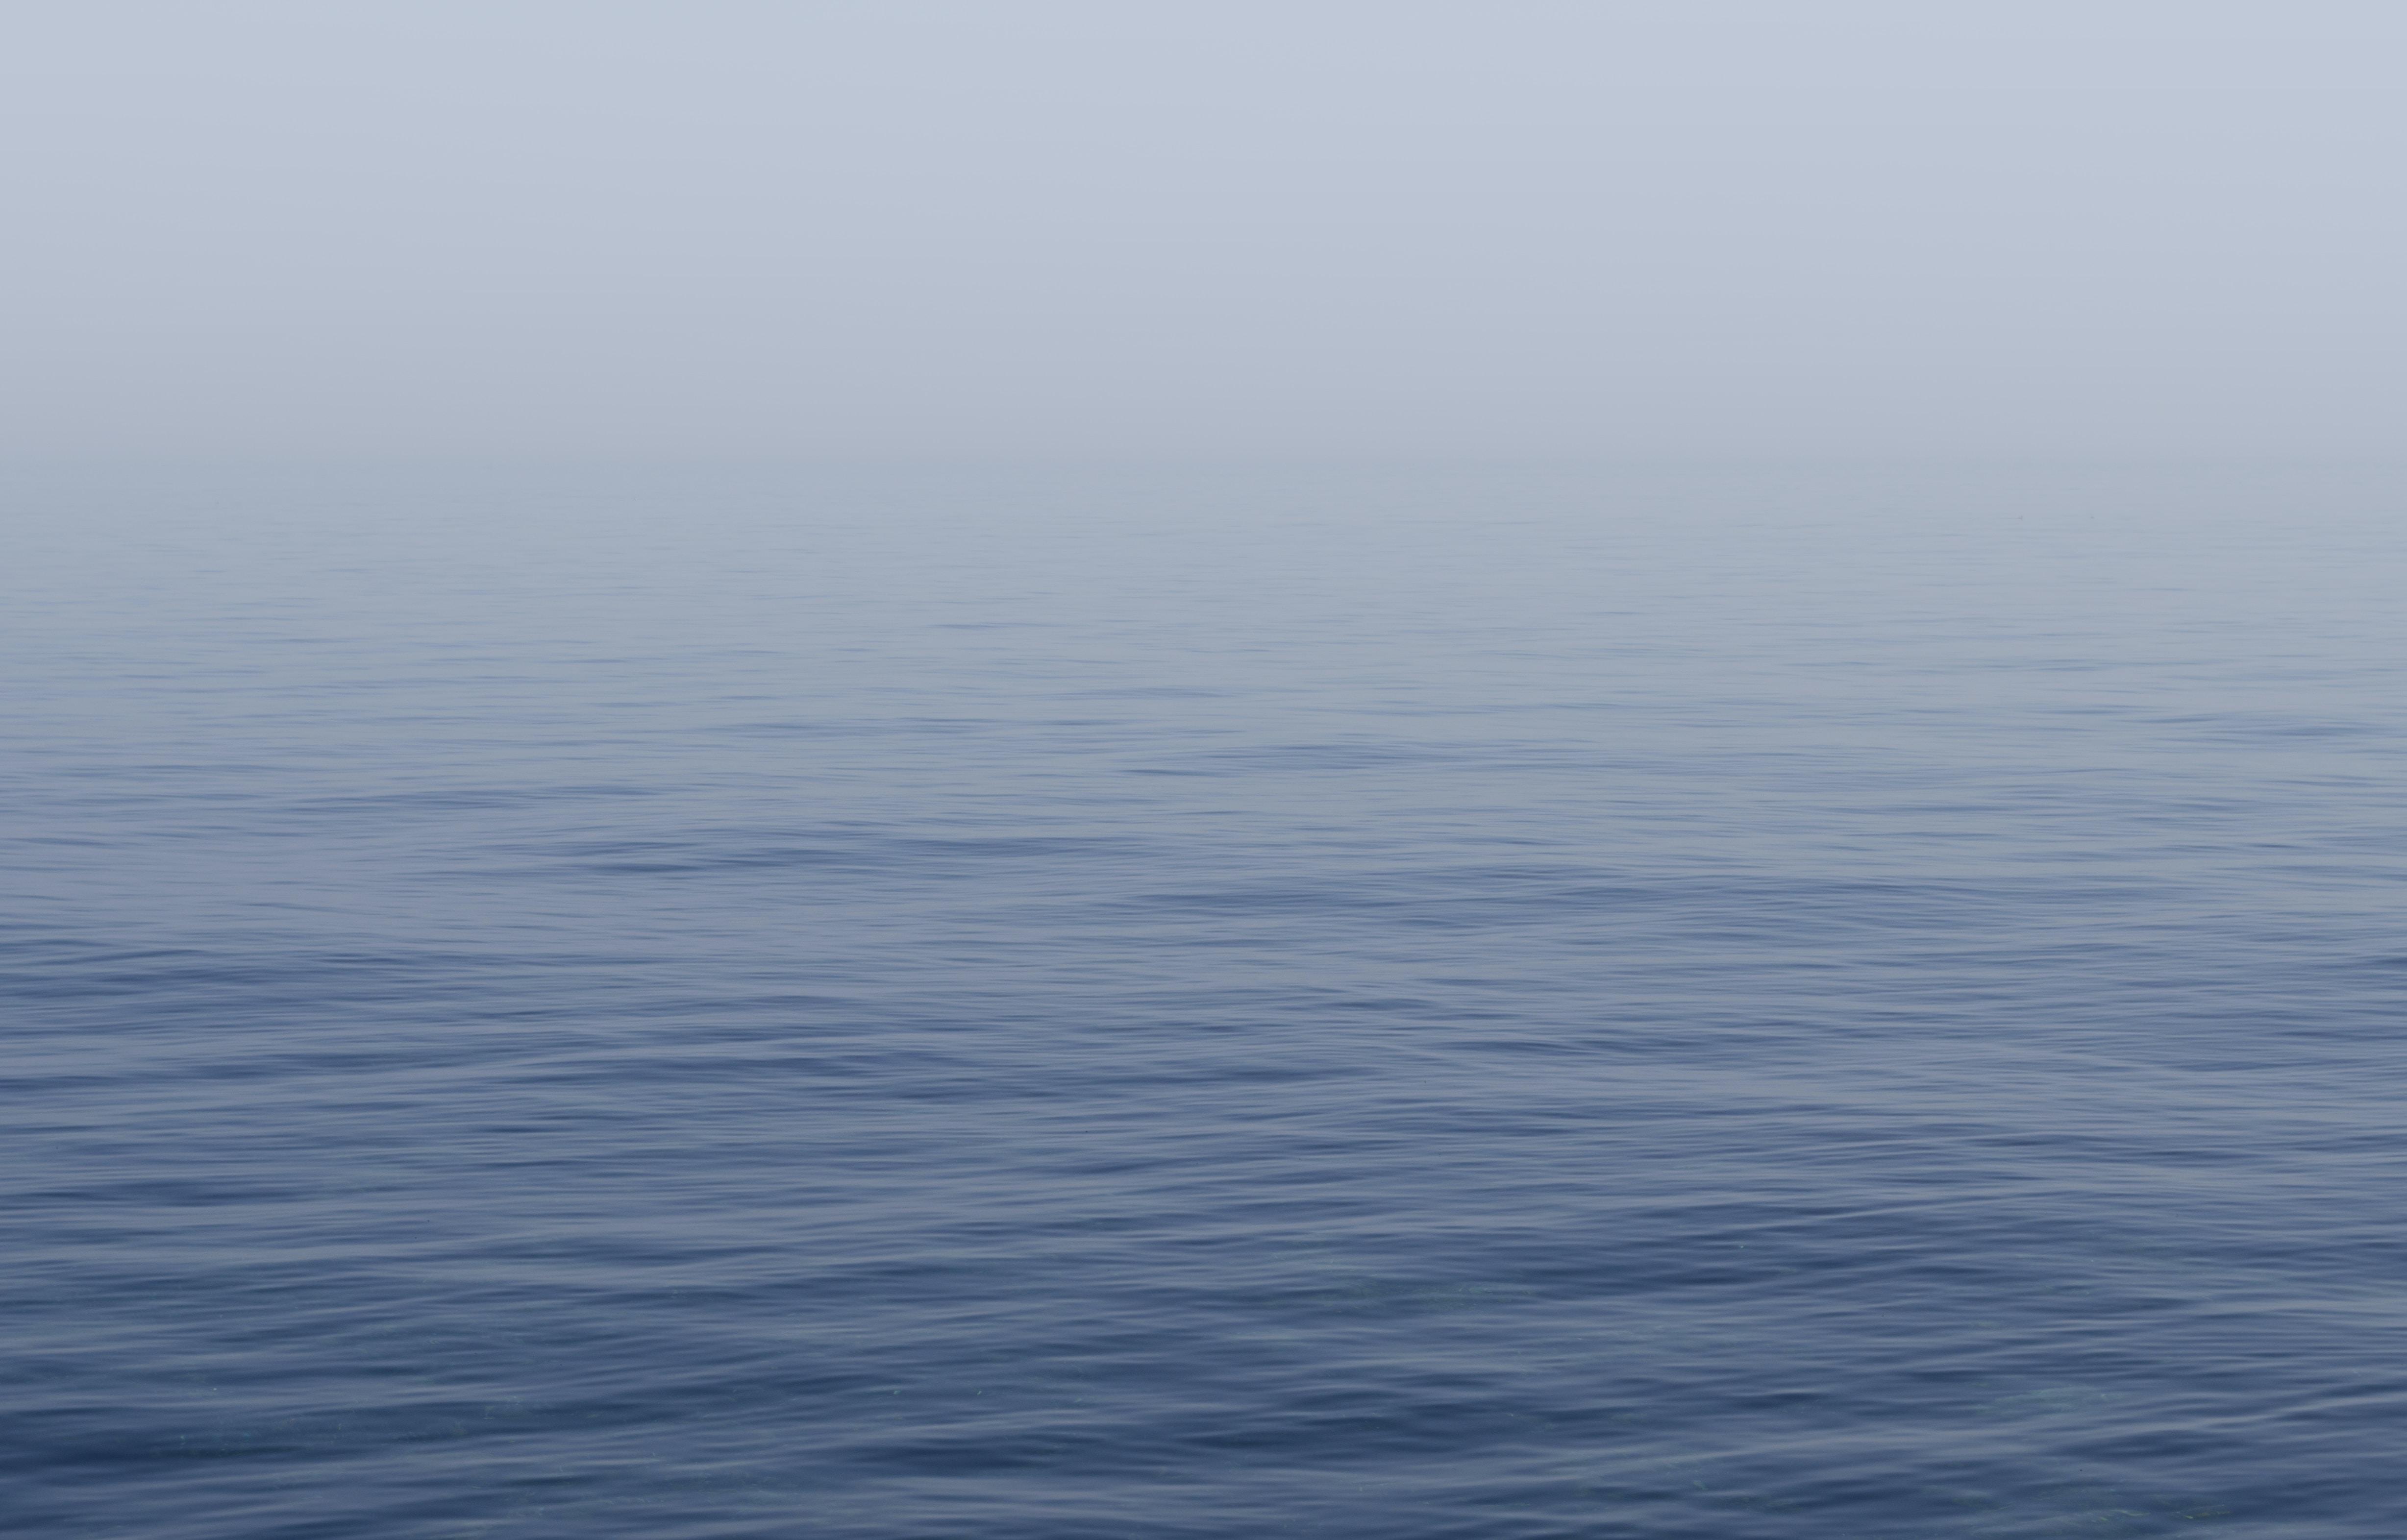 Calm, blue sea covered in a soft mist